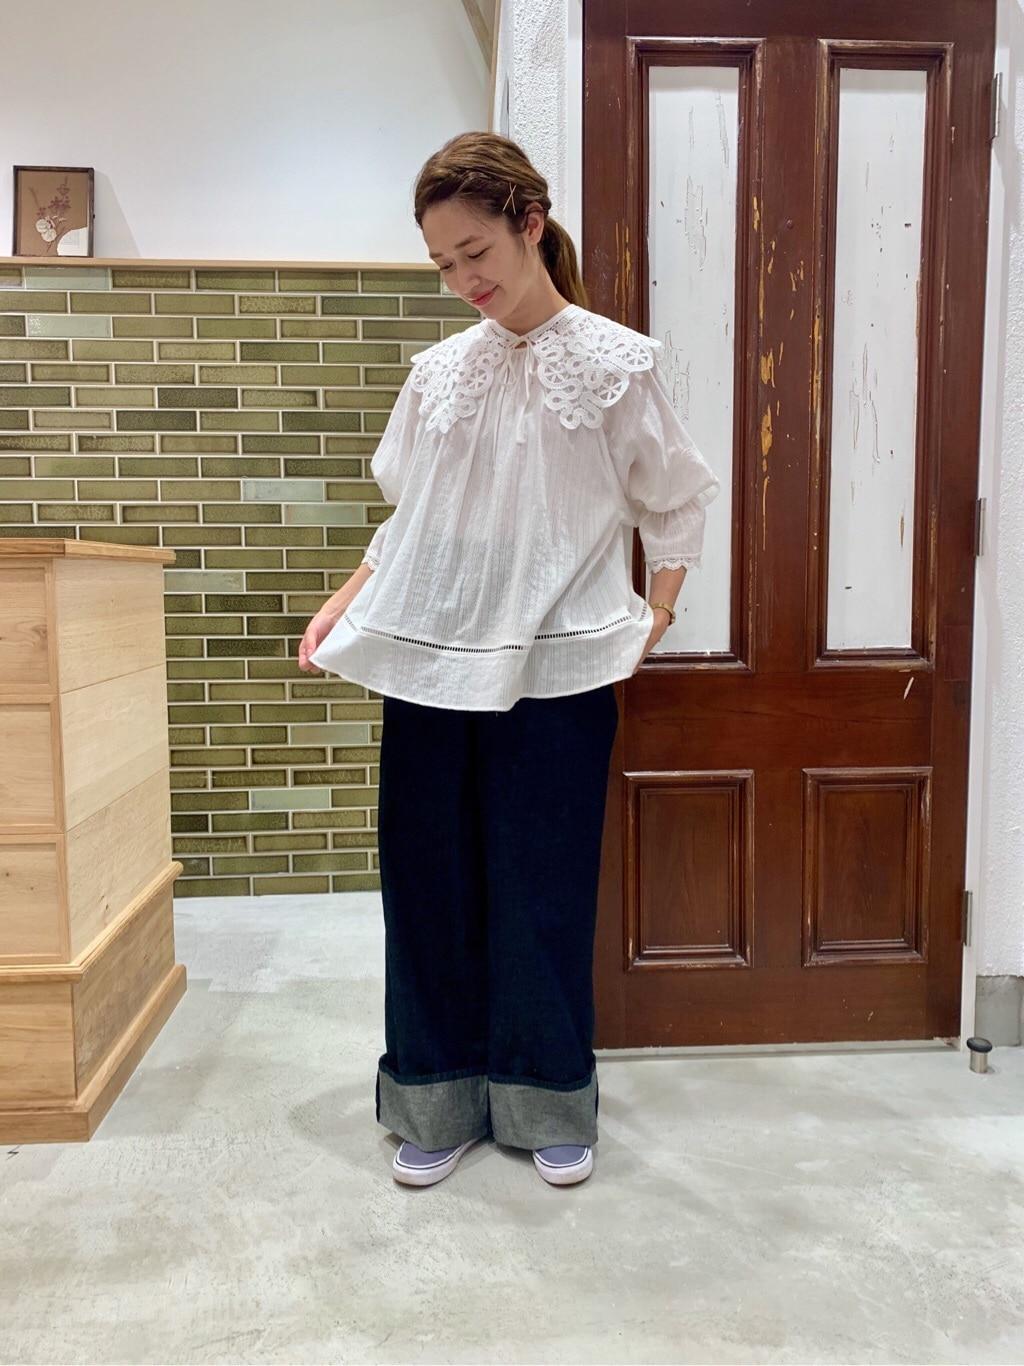 chambre de charme 横浜ジョイナス 身長:160cm 2020.06.11